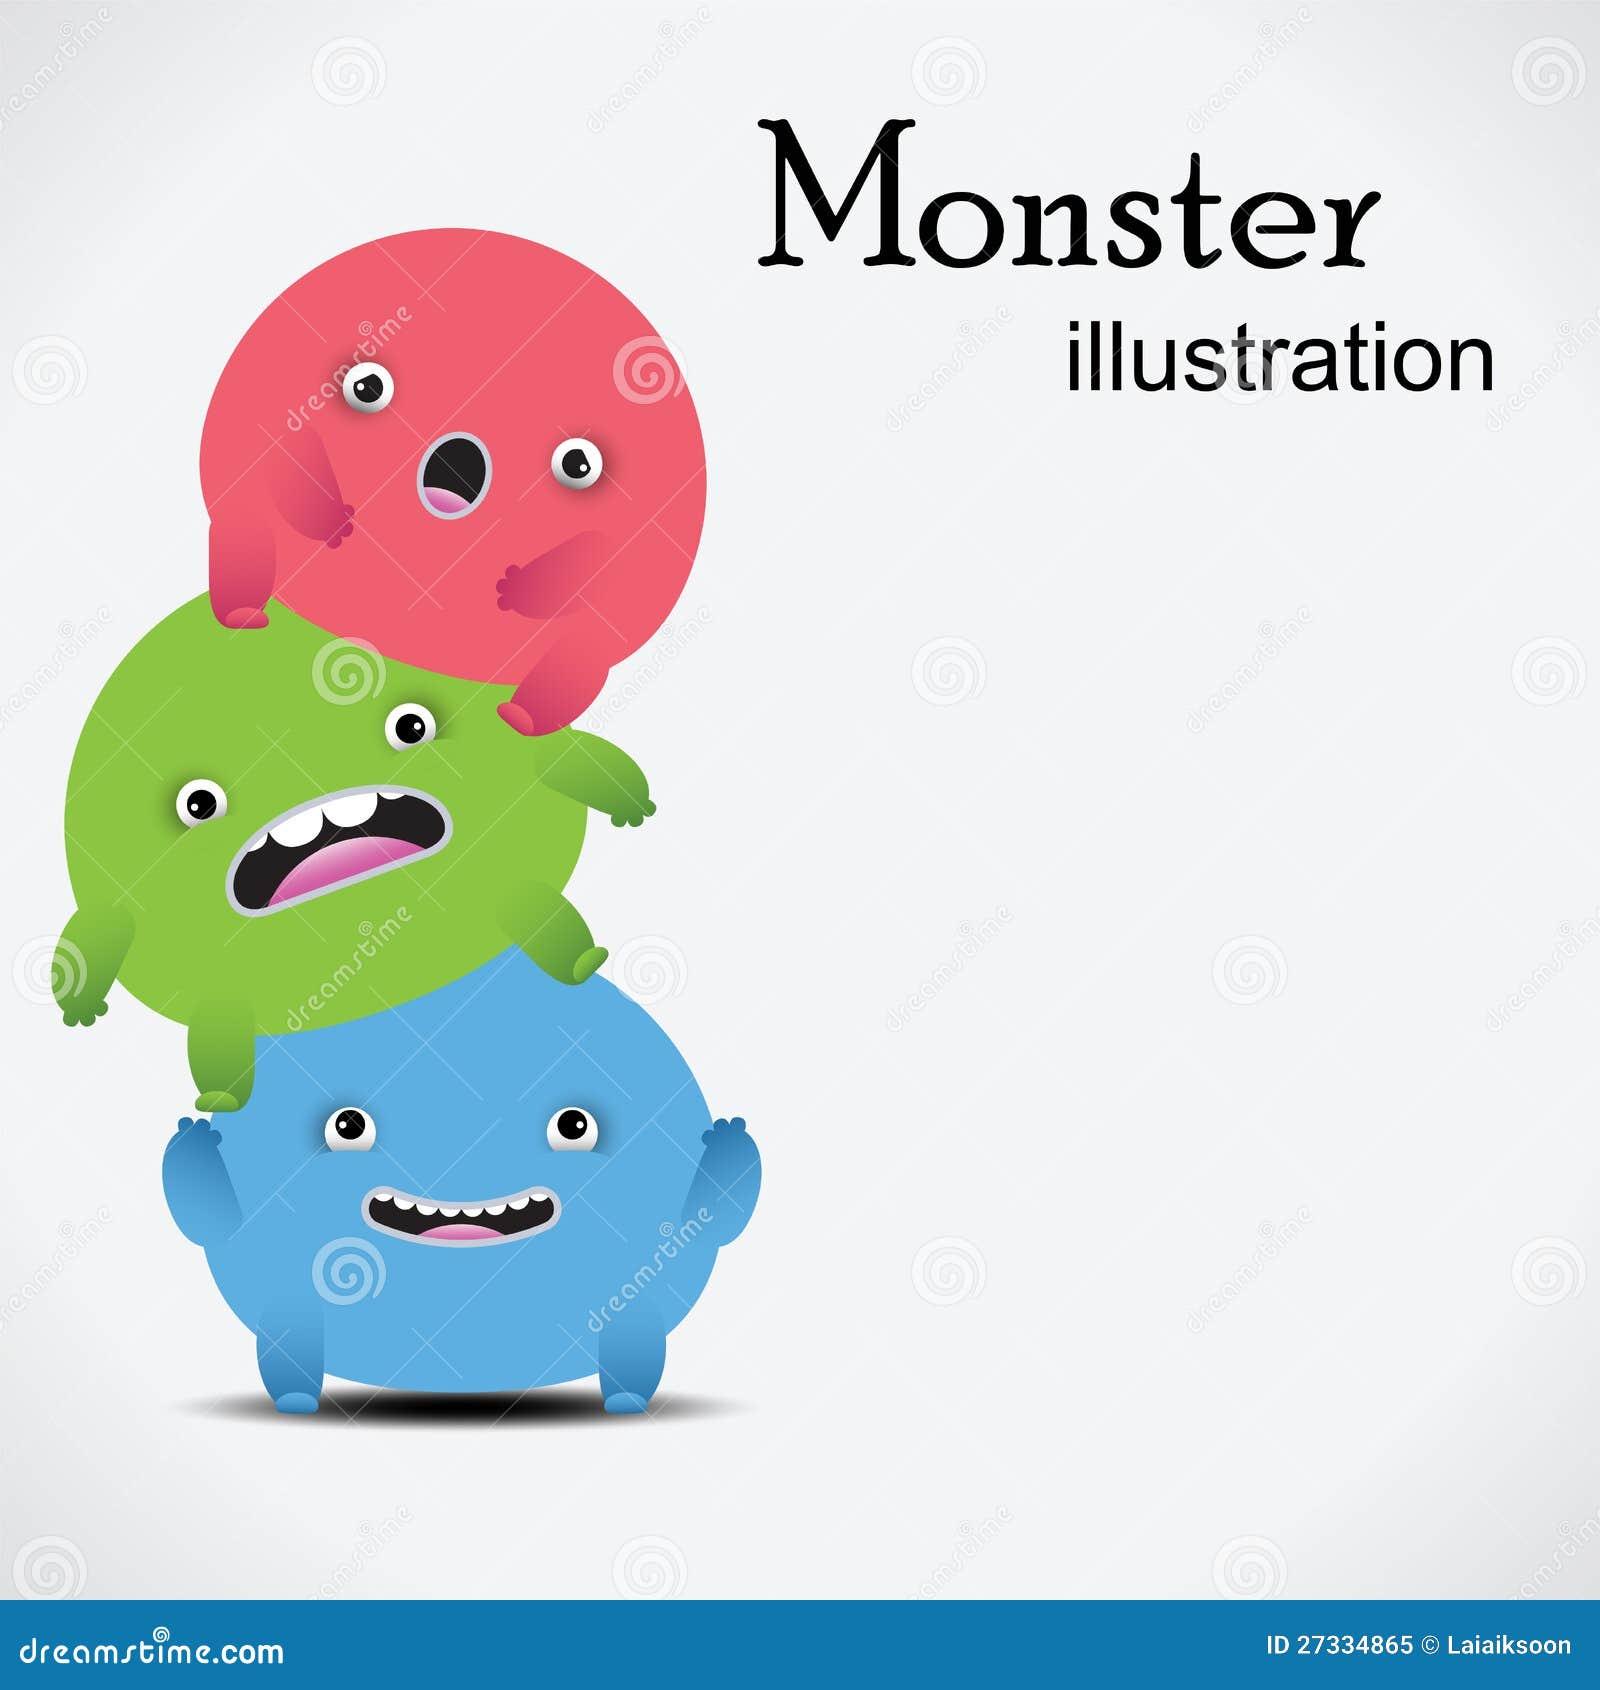 monster illustration royalty free stock photo image monster truck clipart images monster truck clip art color